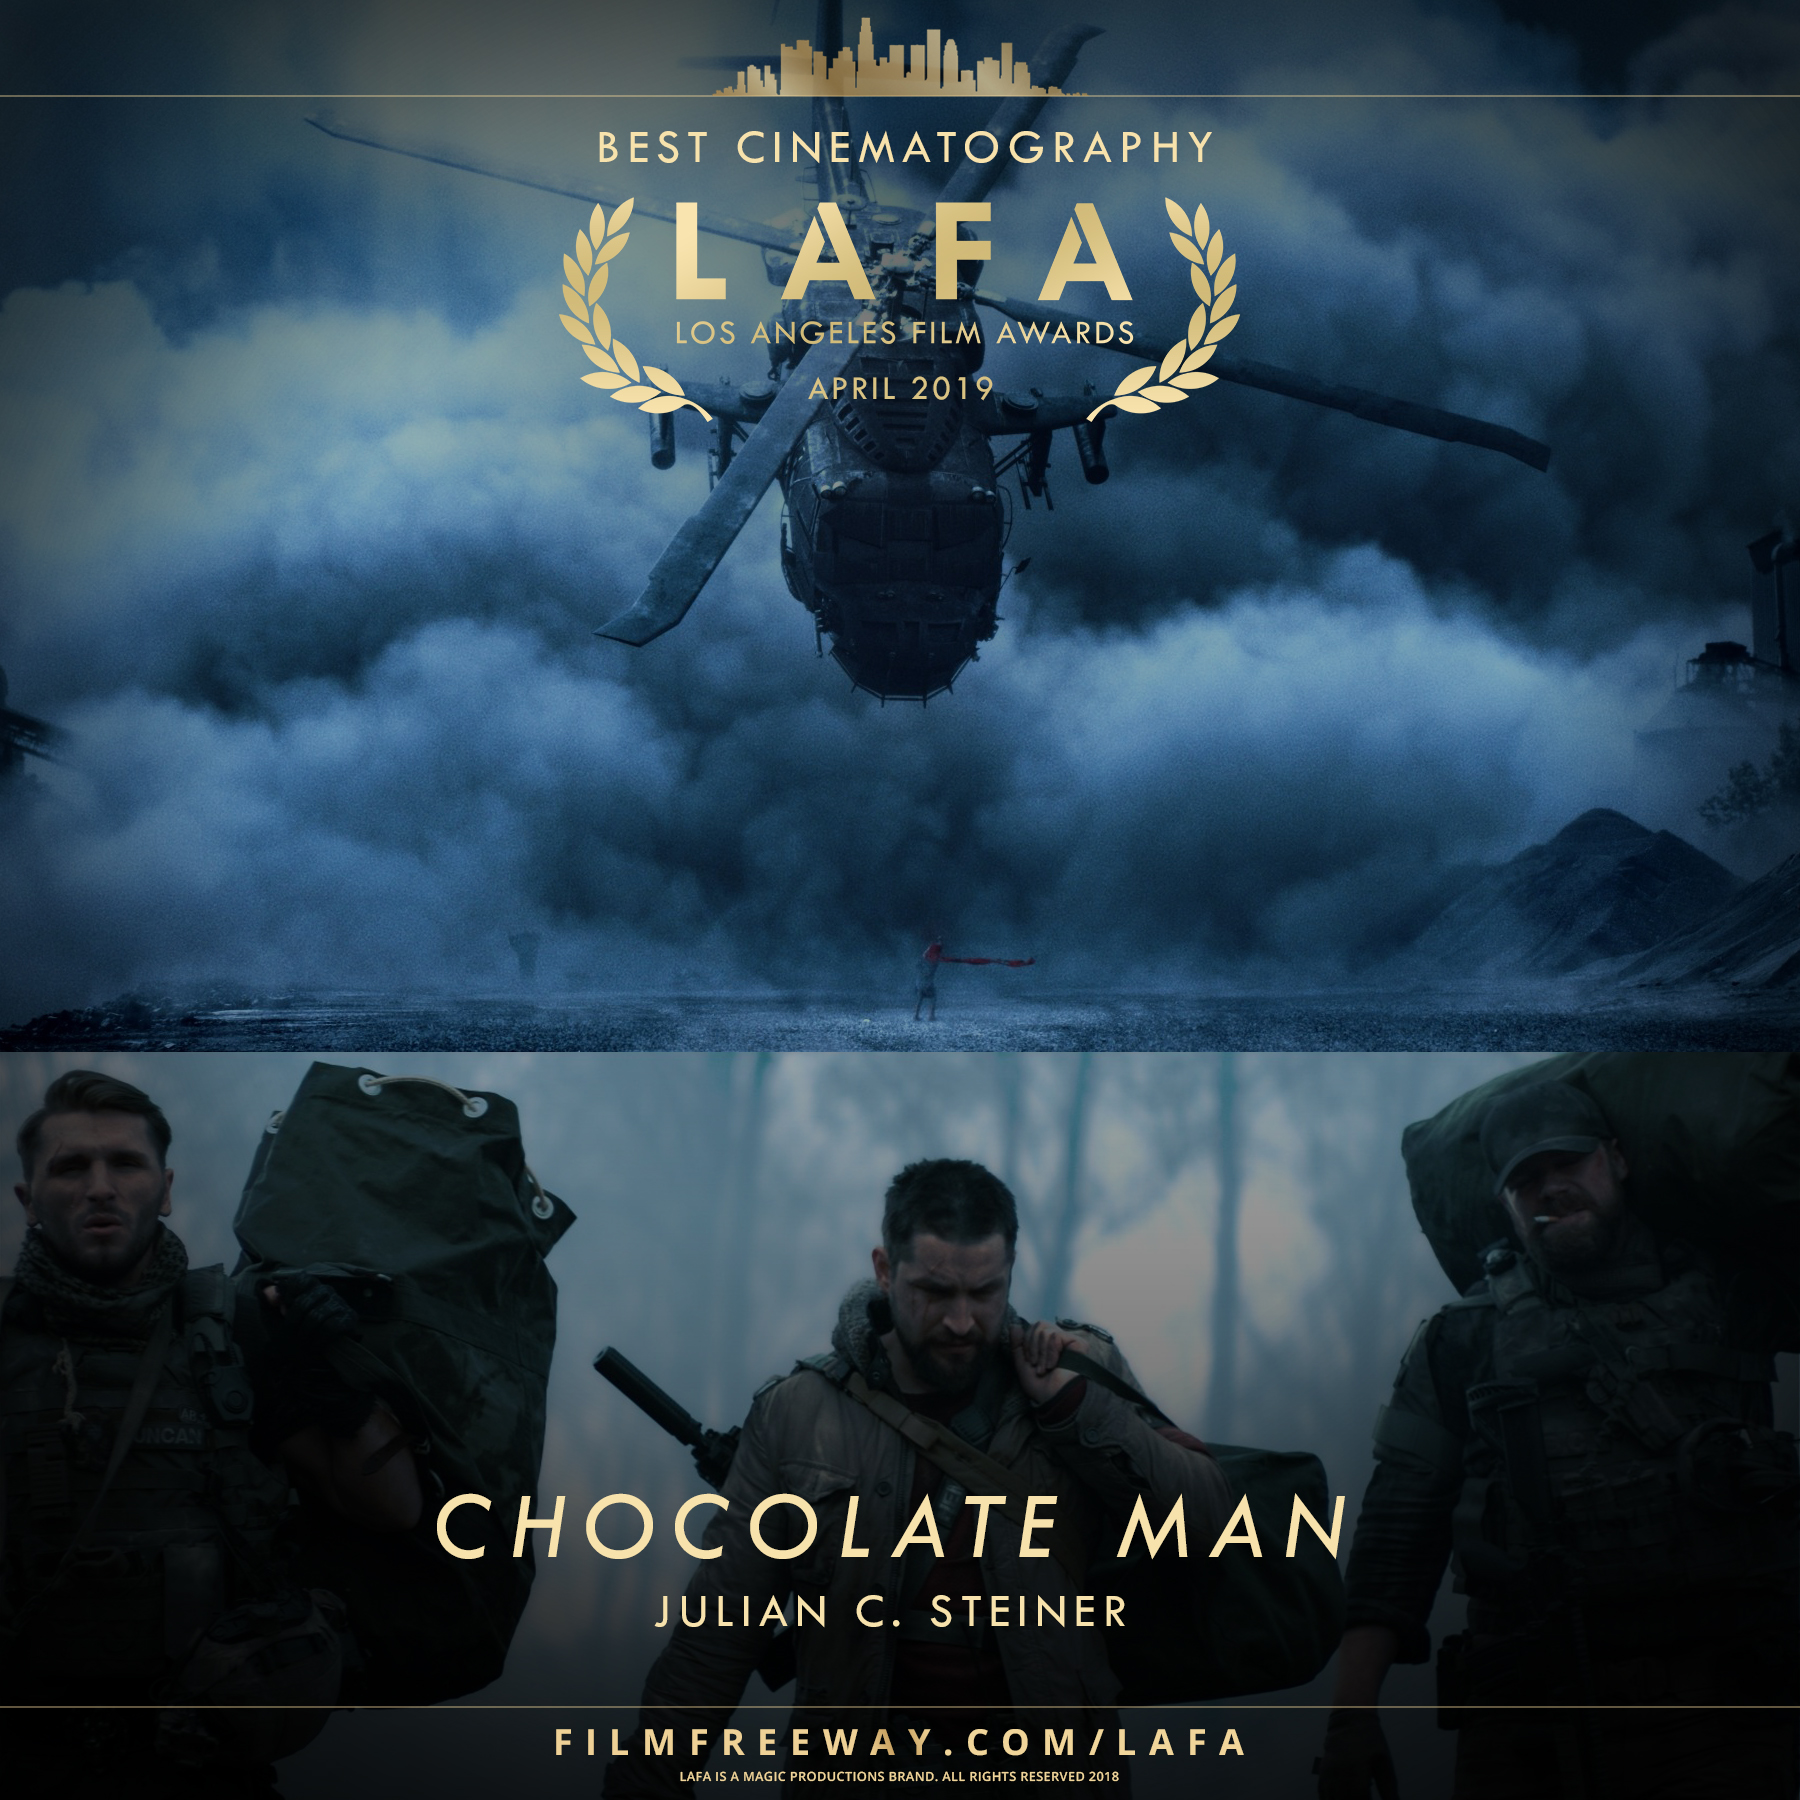 CHOCOLATE MAN design